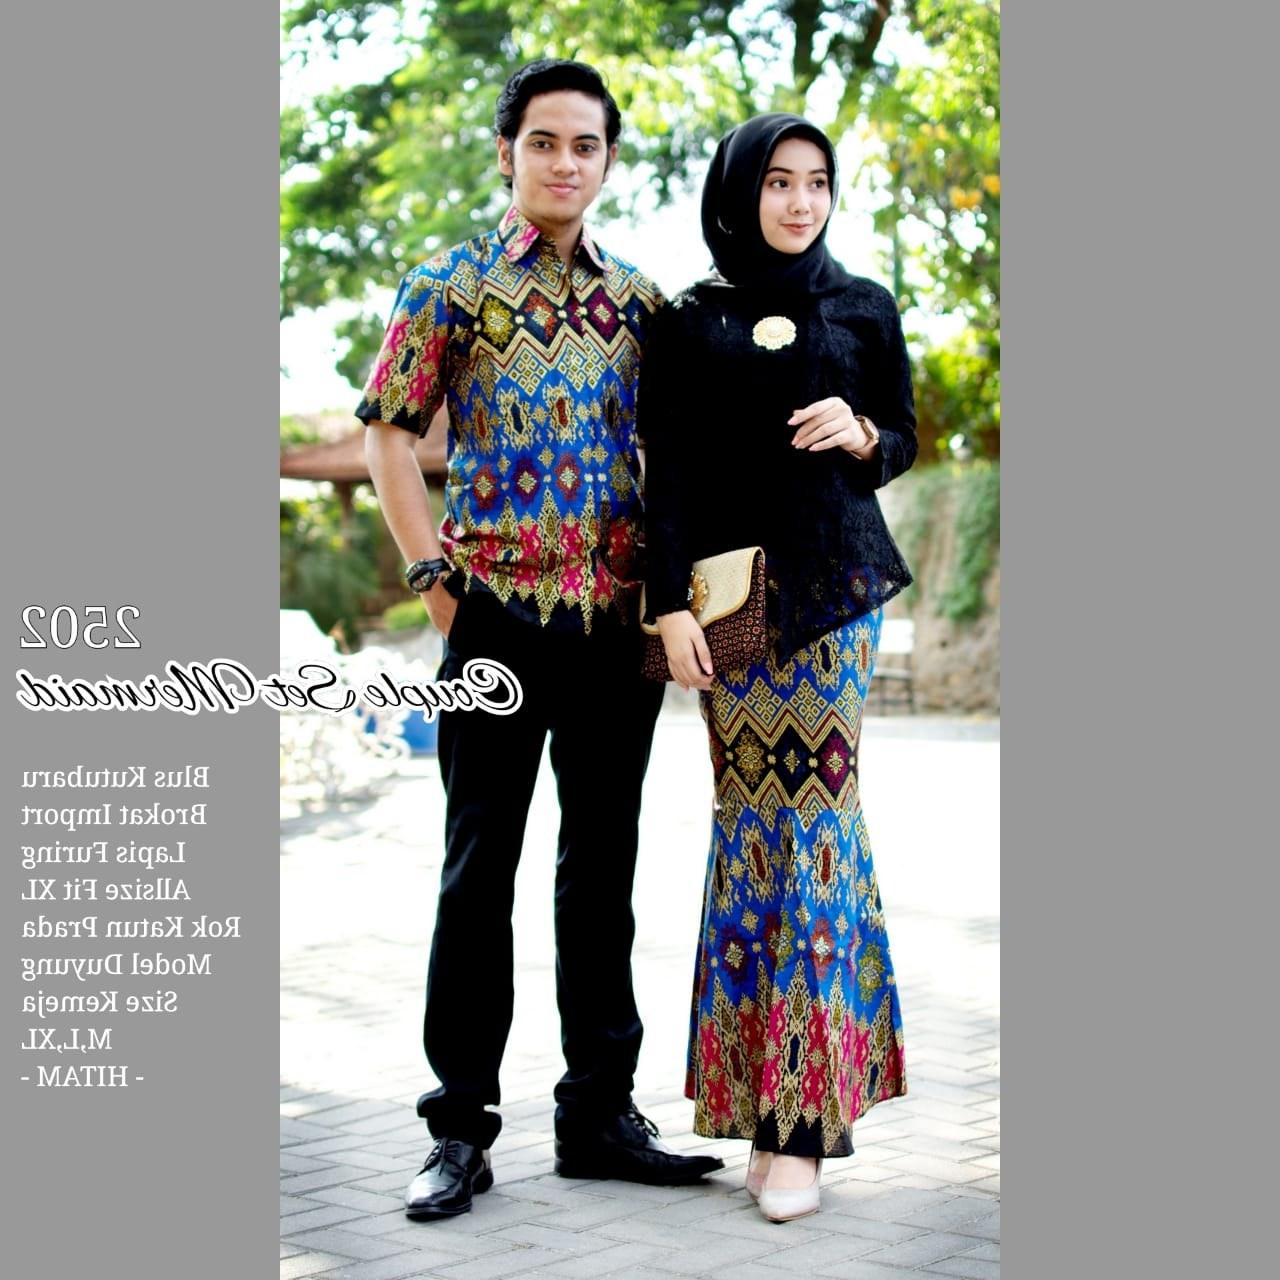 Bentuk Model Baju Bridesmaid Hijab Brokat Jxdu 48 Model Baju Couple Duyung Paling Hist Modelbaju